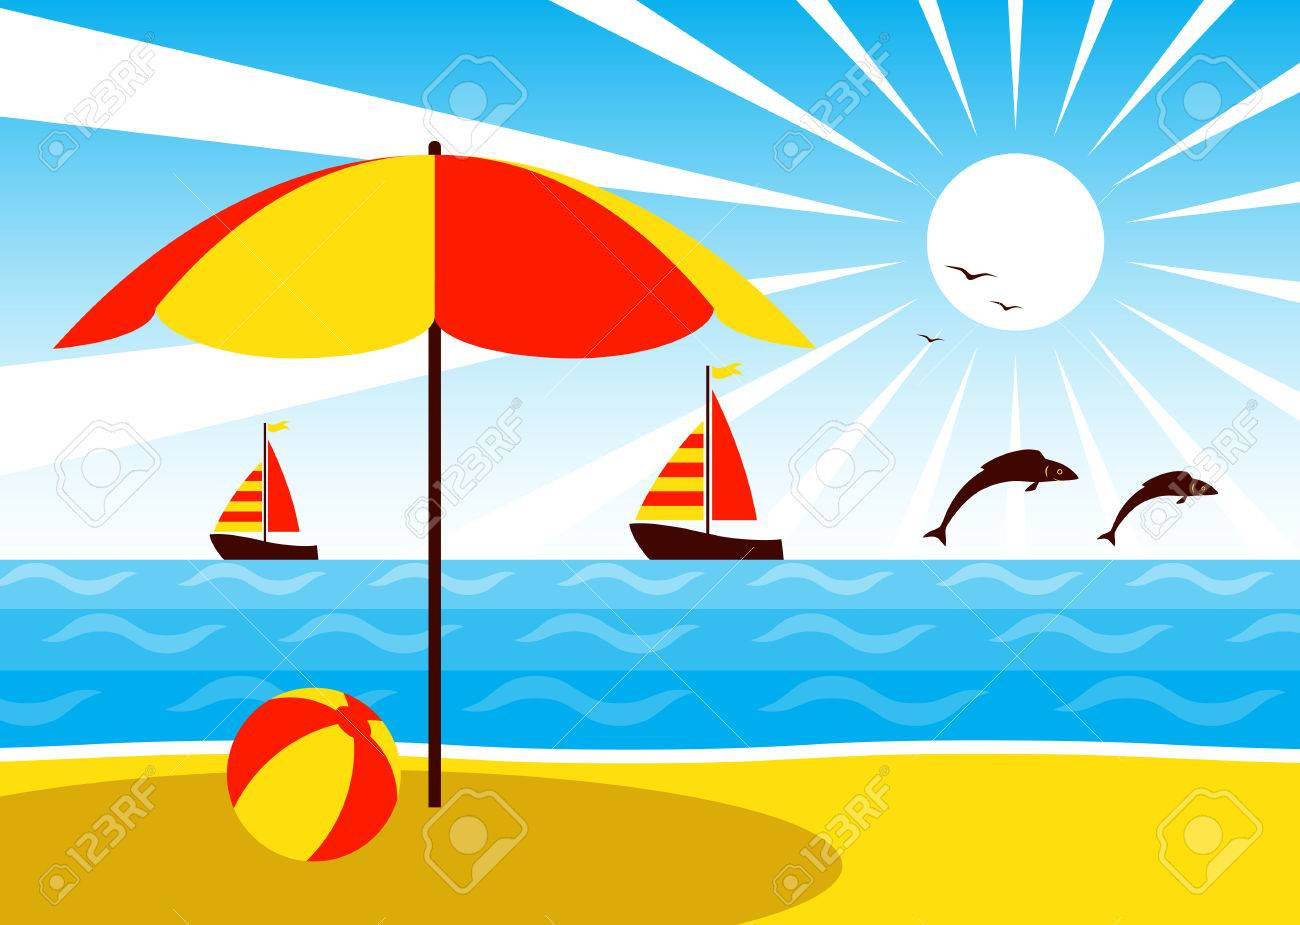 Sonnenschirm clipart gratis  Sonnenschirm Strand Clipart | ambiznes.com